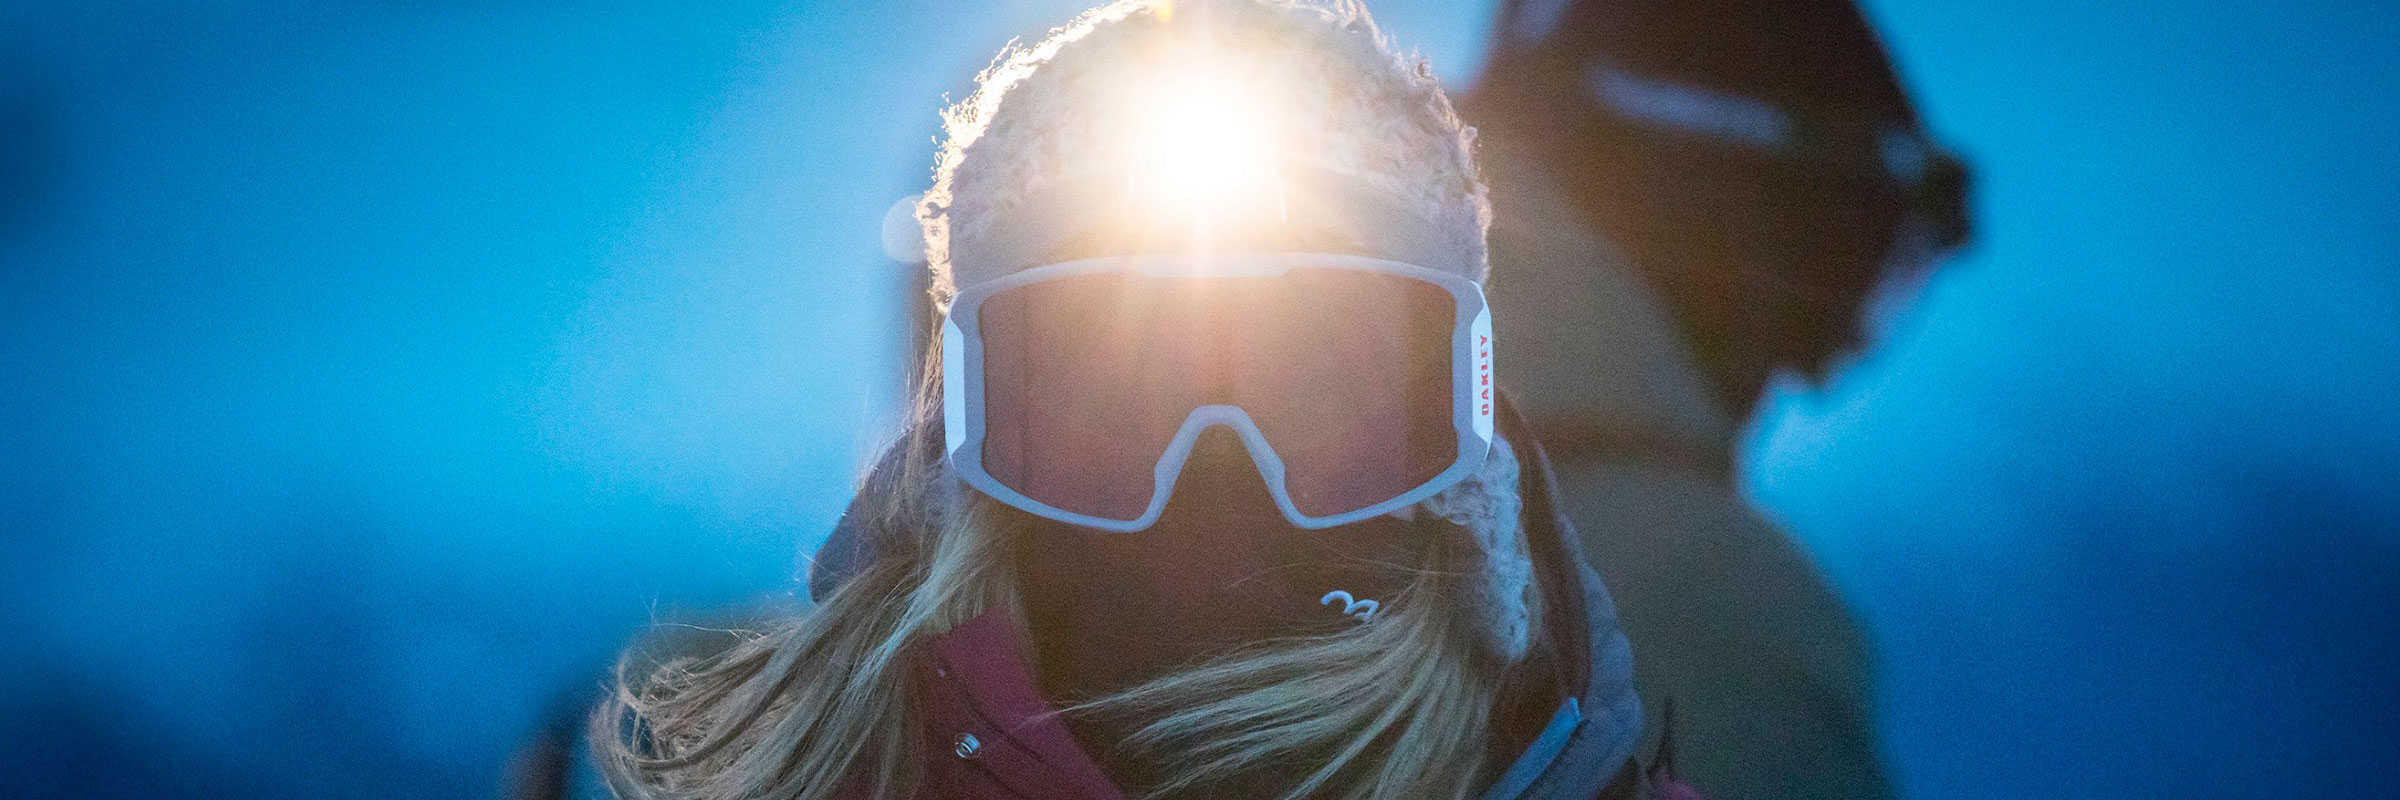 Anon, Oakley, Ski & Snowboard, Smith Optics, Spy. How to Choose the Right Goggles